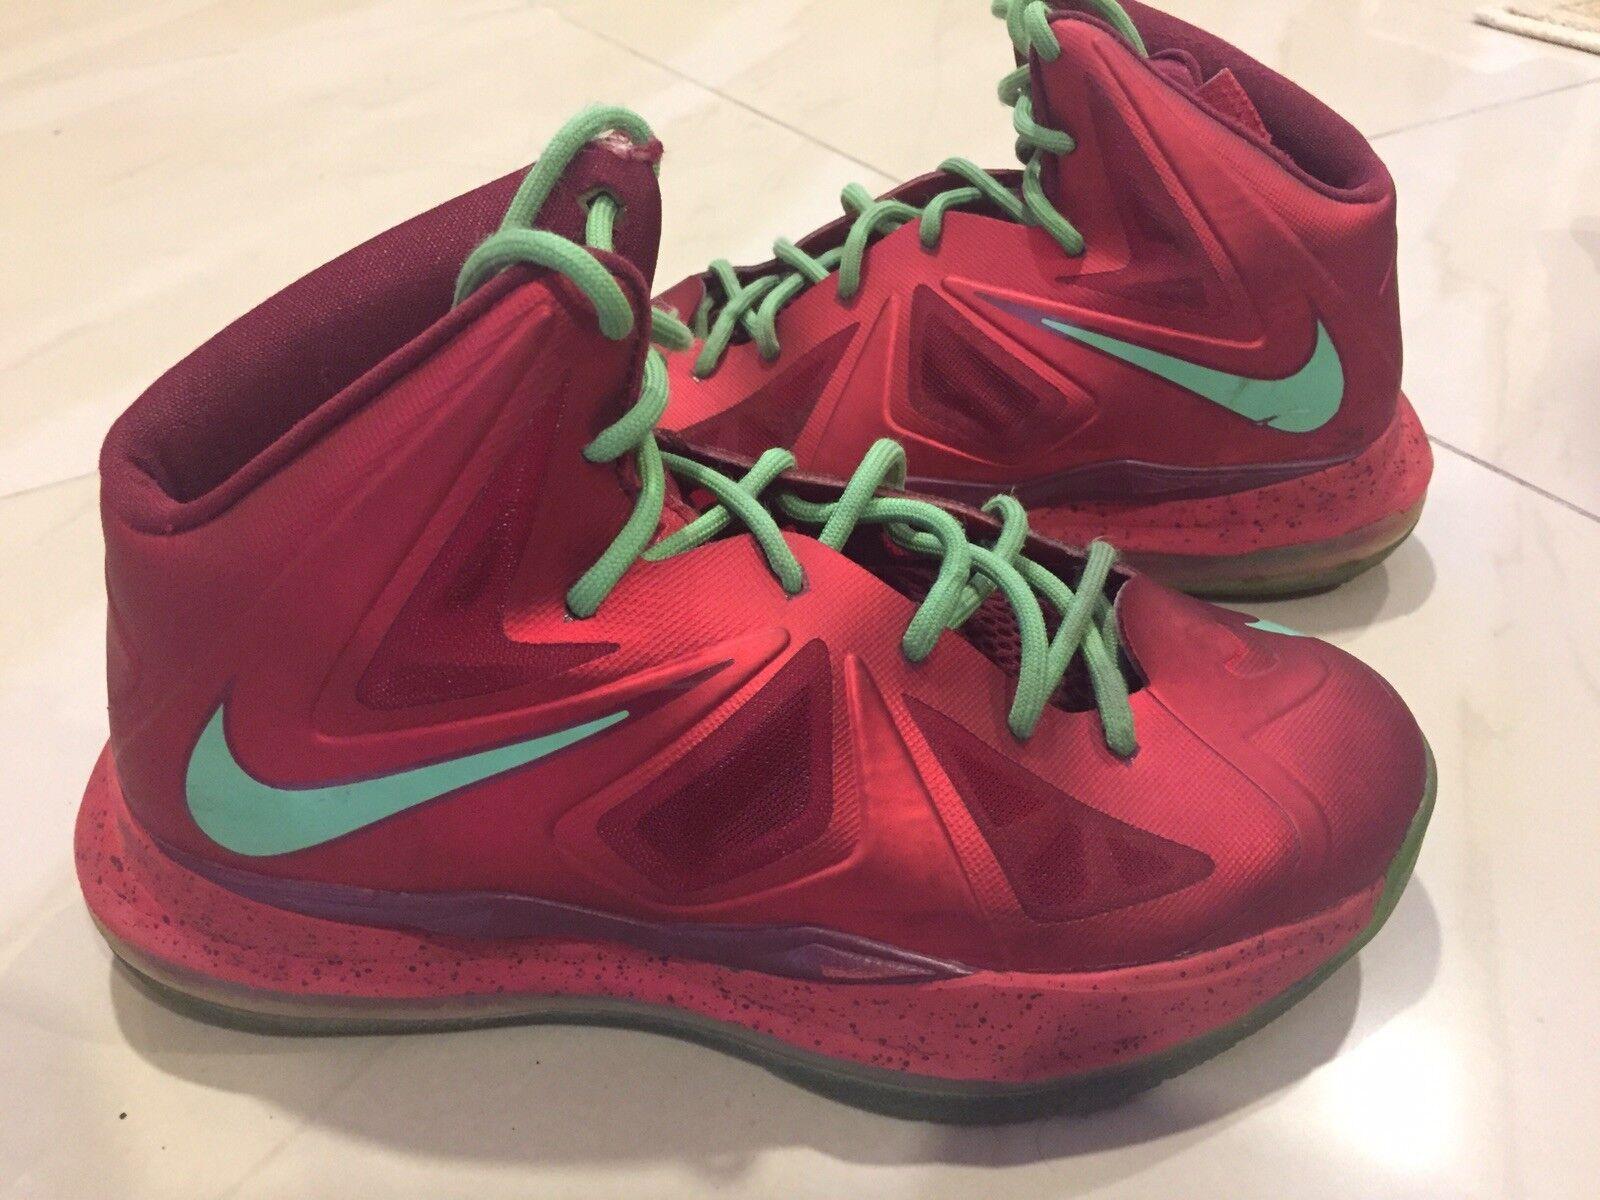 Nike Lebron X 10 RED CHRISTMAS Comfortable Cheap women's shoes women's shoes